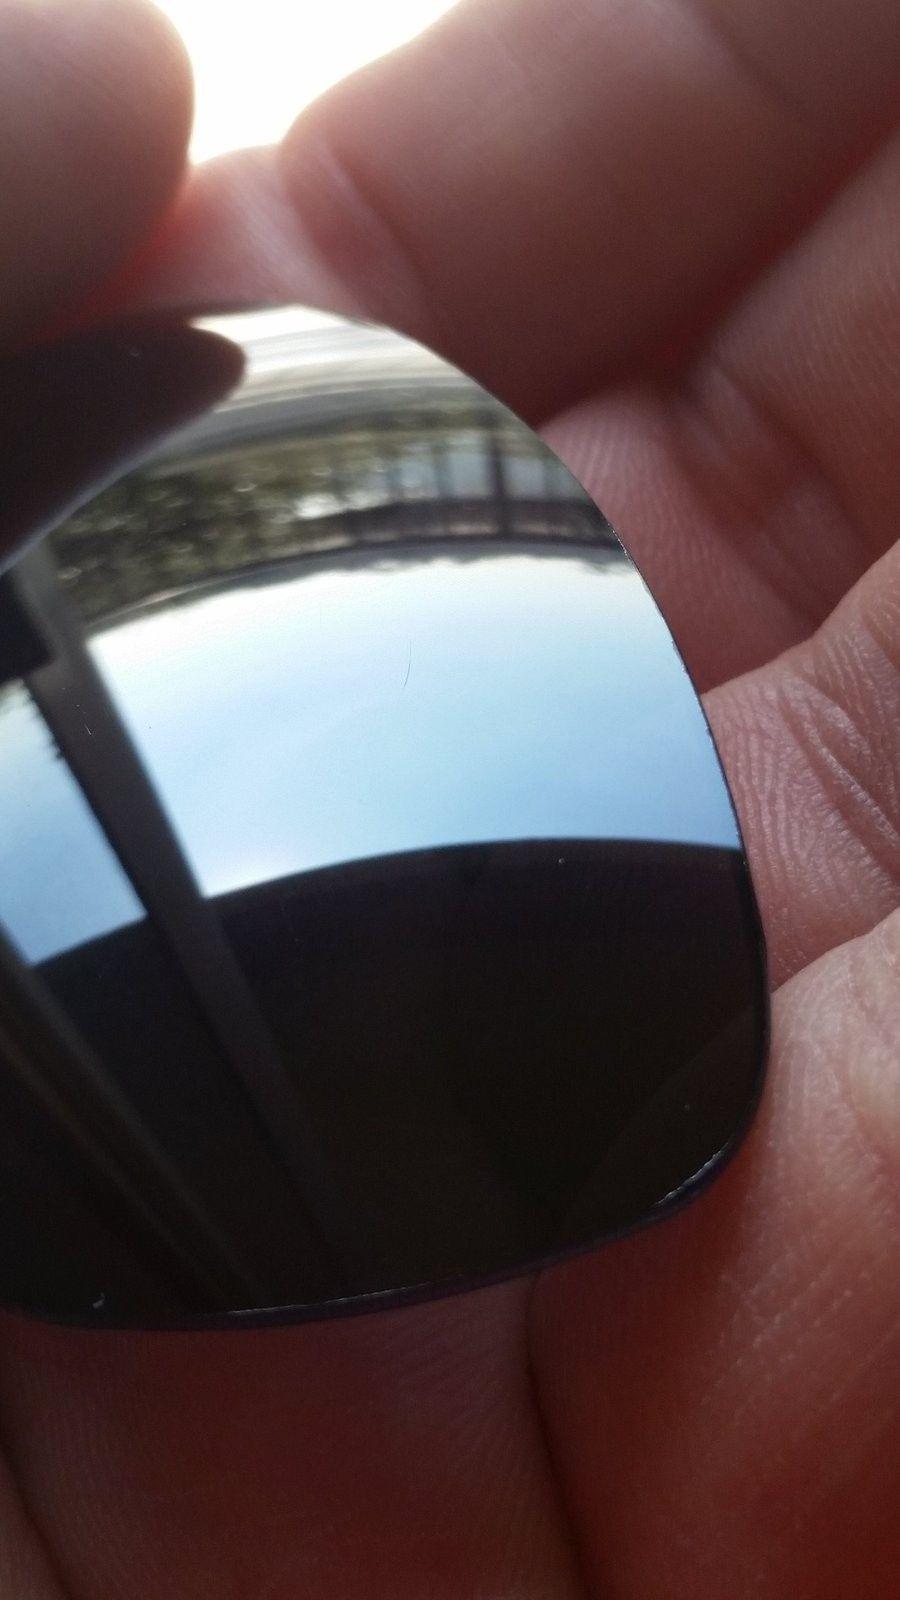 Oakley Ducati and Black iridiumJuliet lenses - uploadfromtaptalk1420652131241.jpg